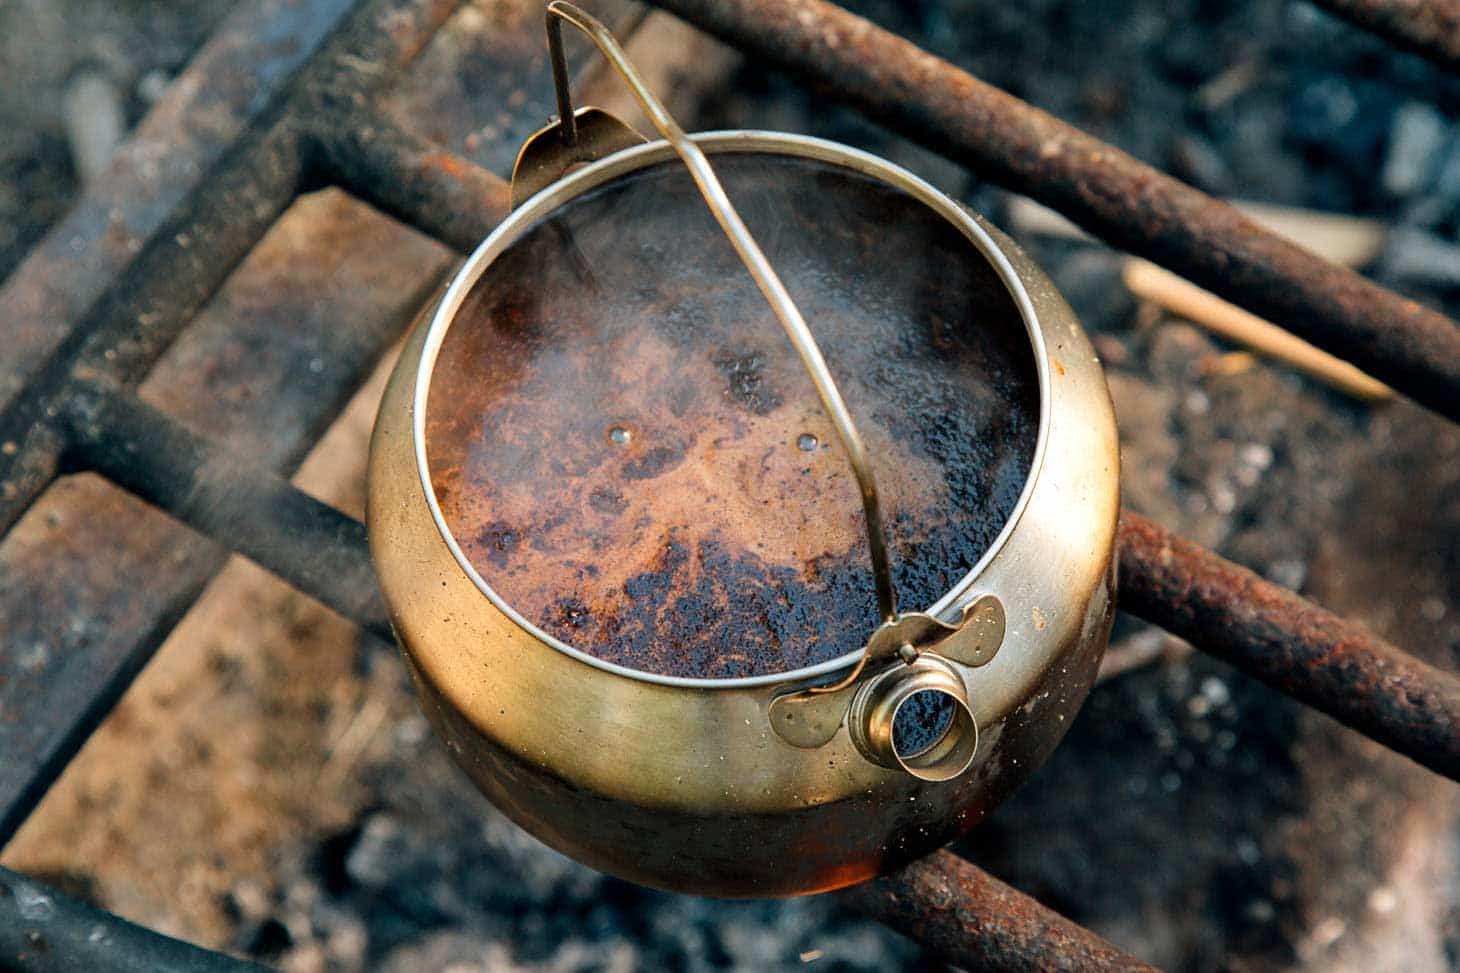 A pot of cowboy coffee on a campfire